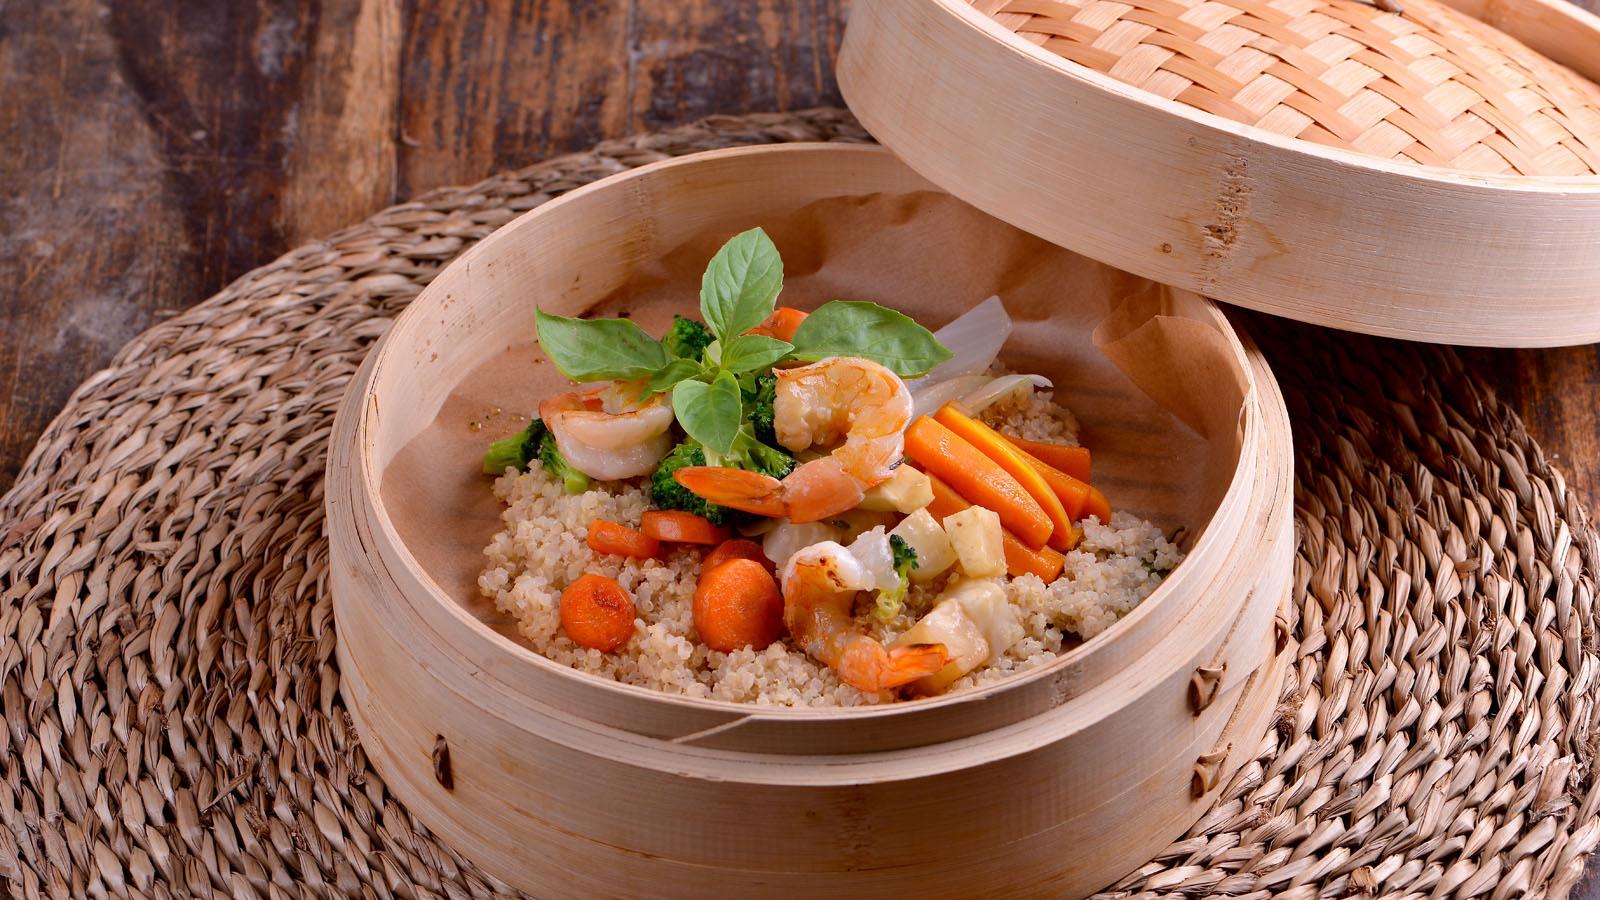 Quinoa estilo thai sergio fern ndez receta canal cocina for Canal cocina sergio fernandez